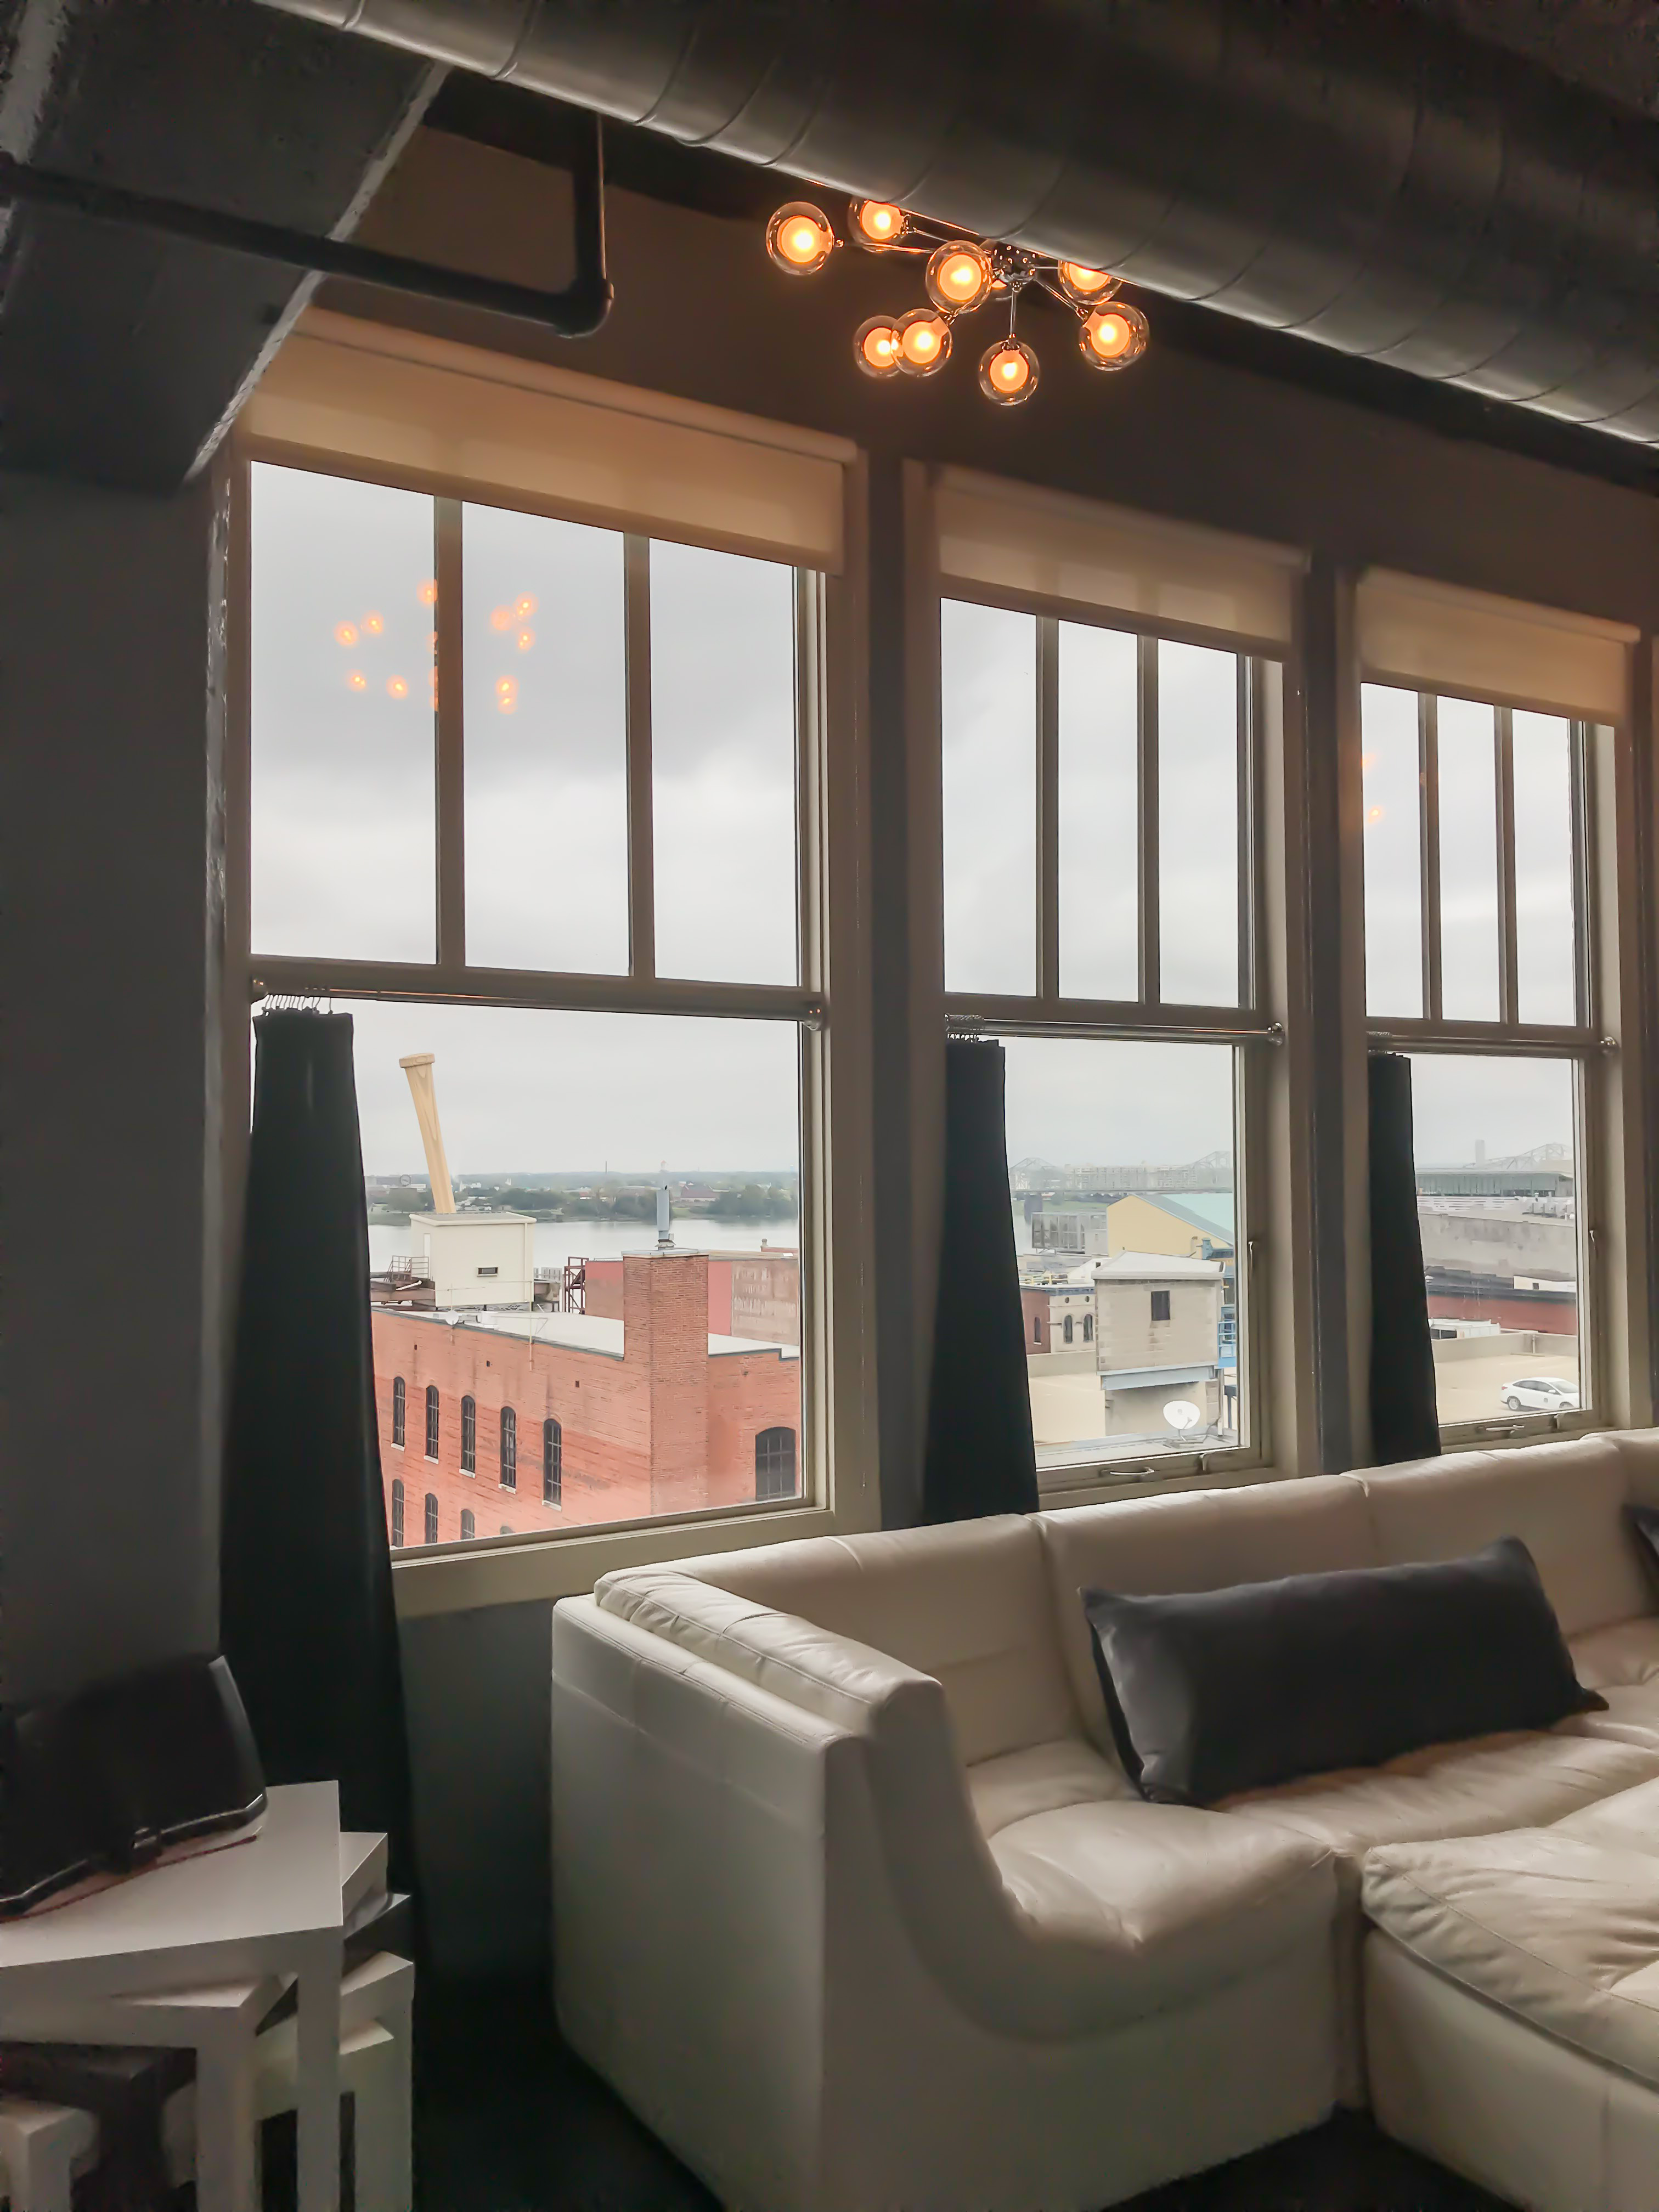 Loft Reverie Hotel 803 - Views + Louisville Slugger + Ohio River + Dreamy Views